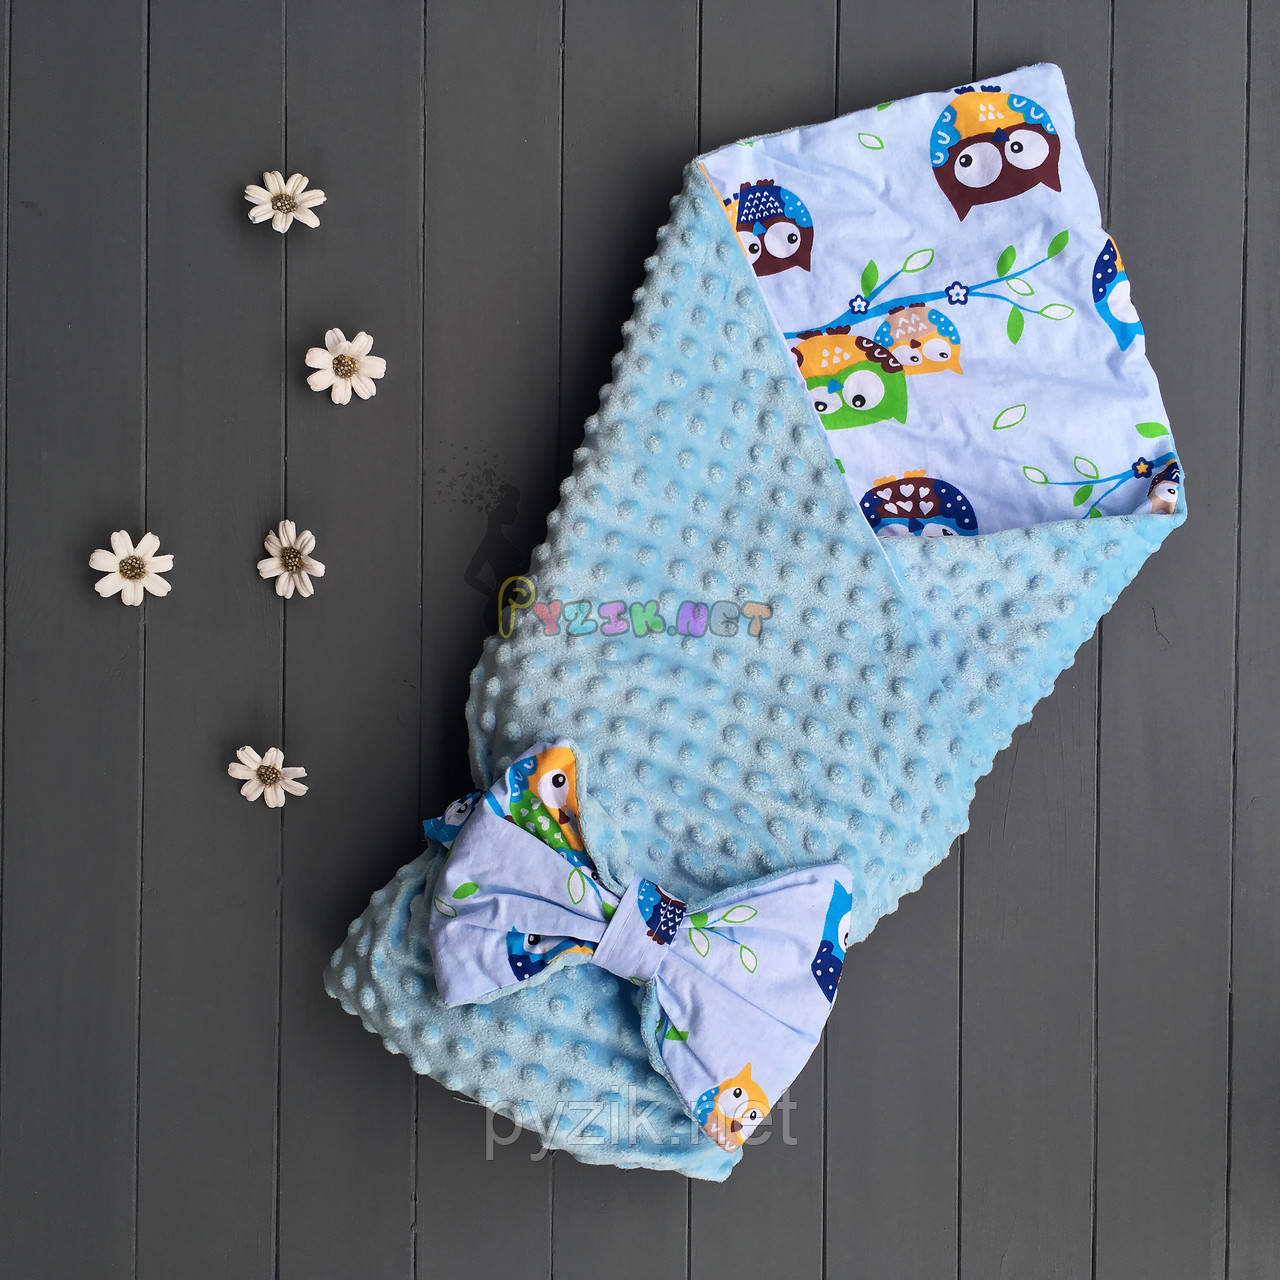 Конверт-одеяло минки на синтепоне голубой с совами